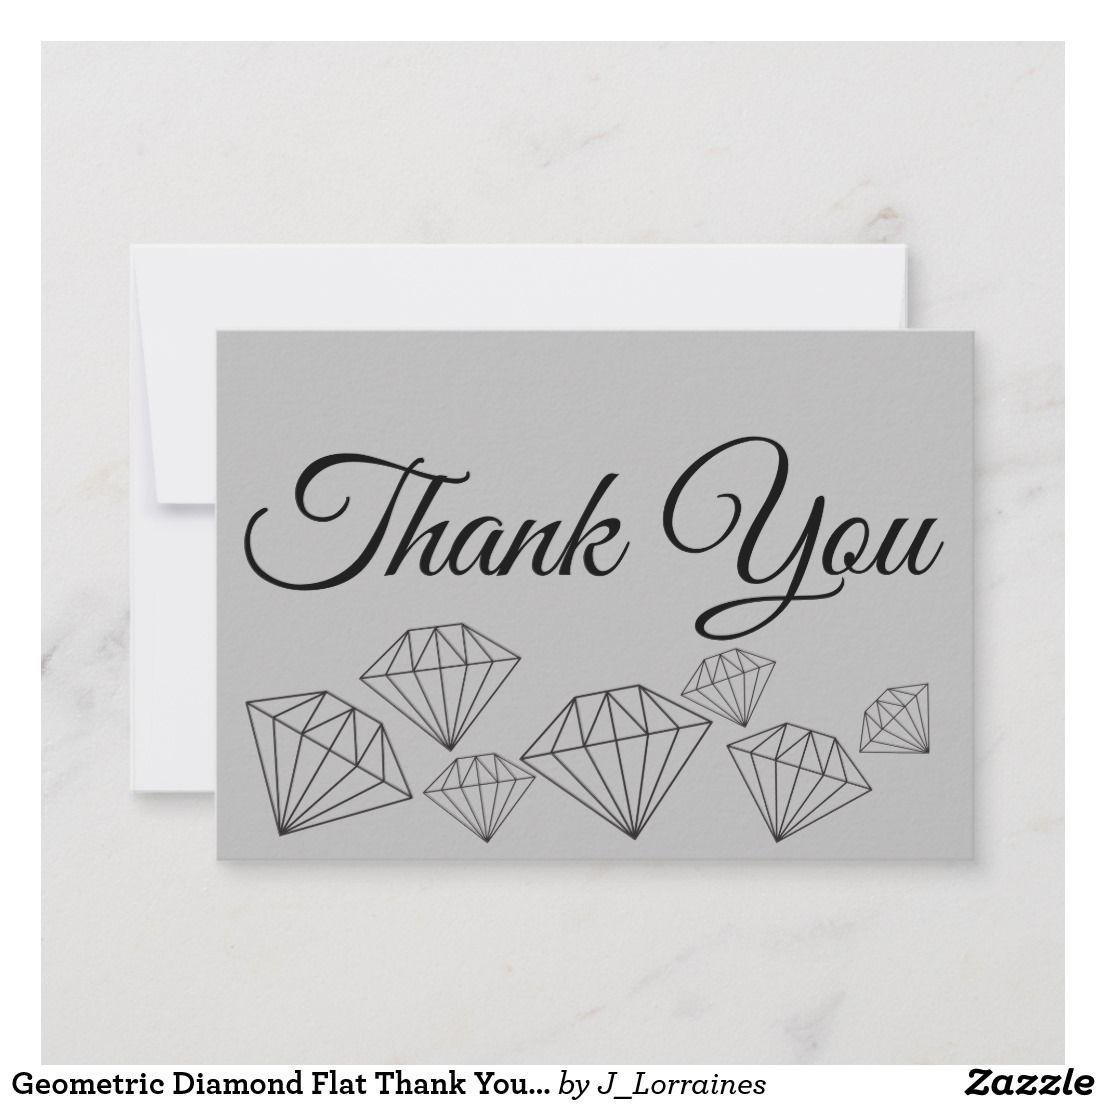 Geometric Diamond Flat Thank You Card Thankyou Thankyounotes Thankyoucards Thank You Note Cards Thank You Cards Geometric Diamond